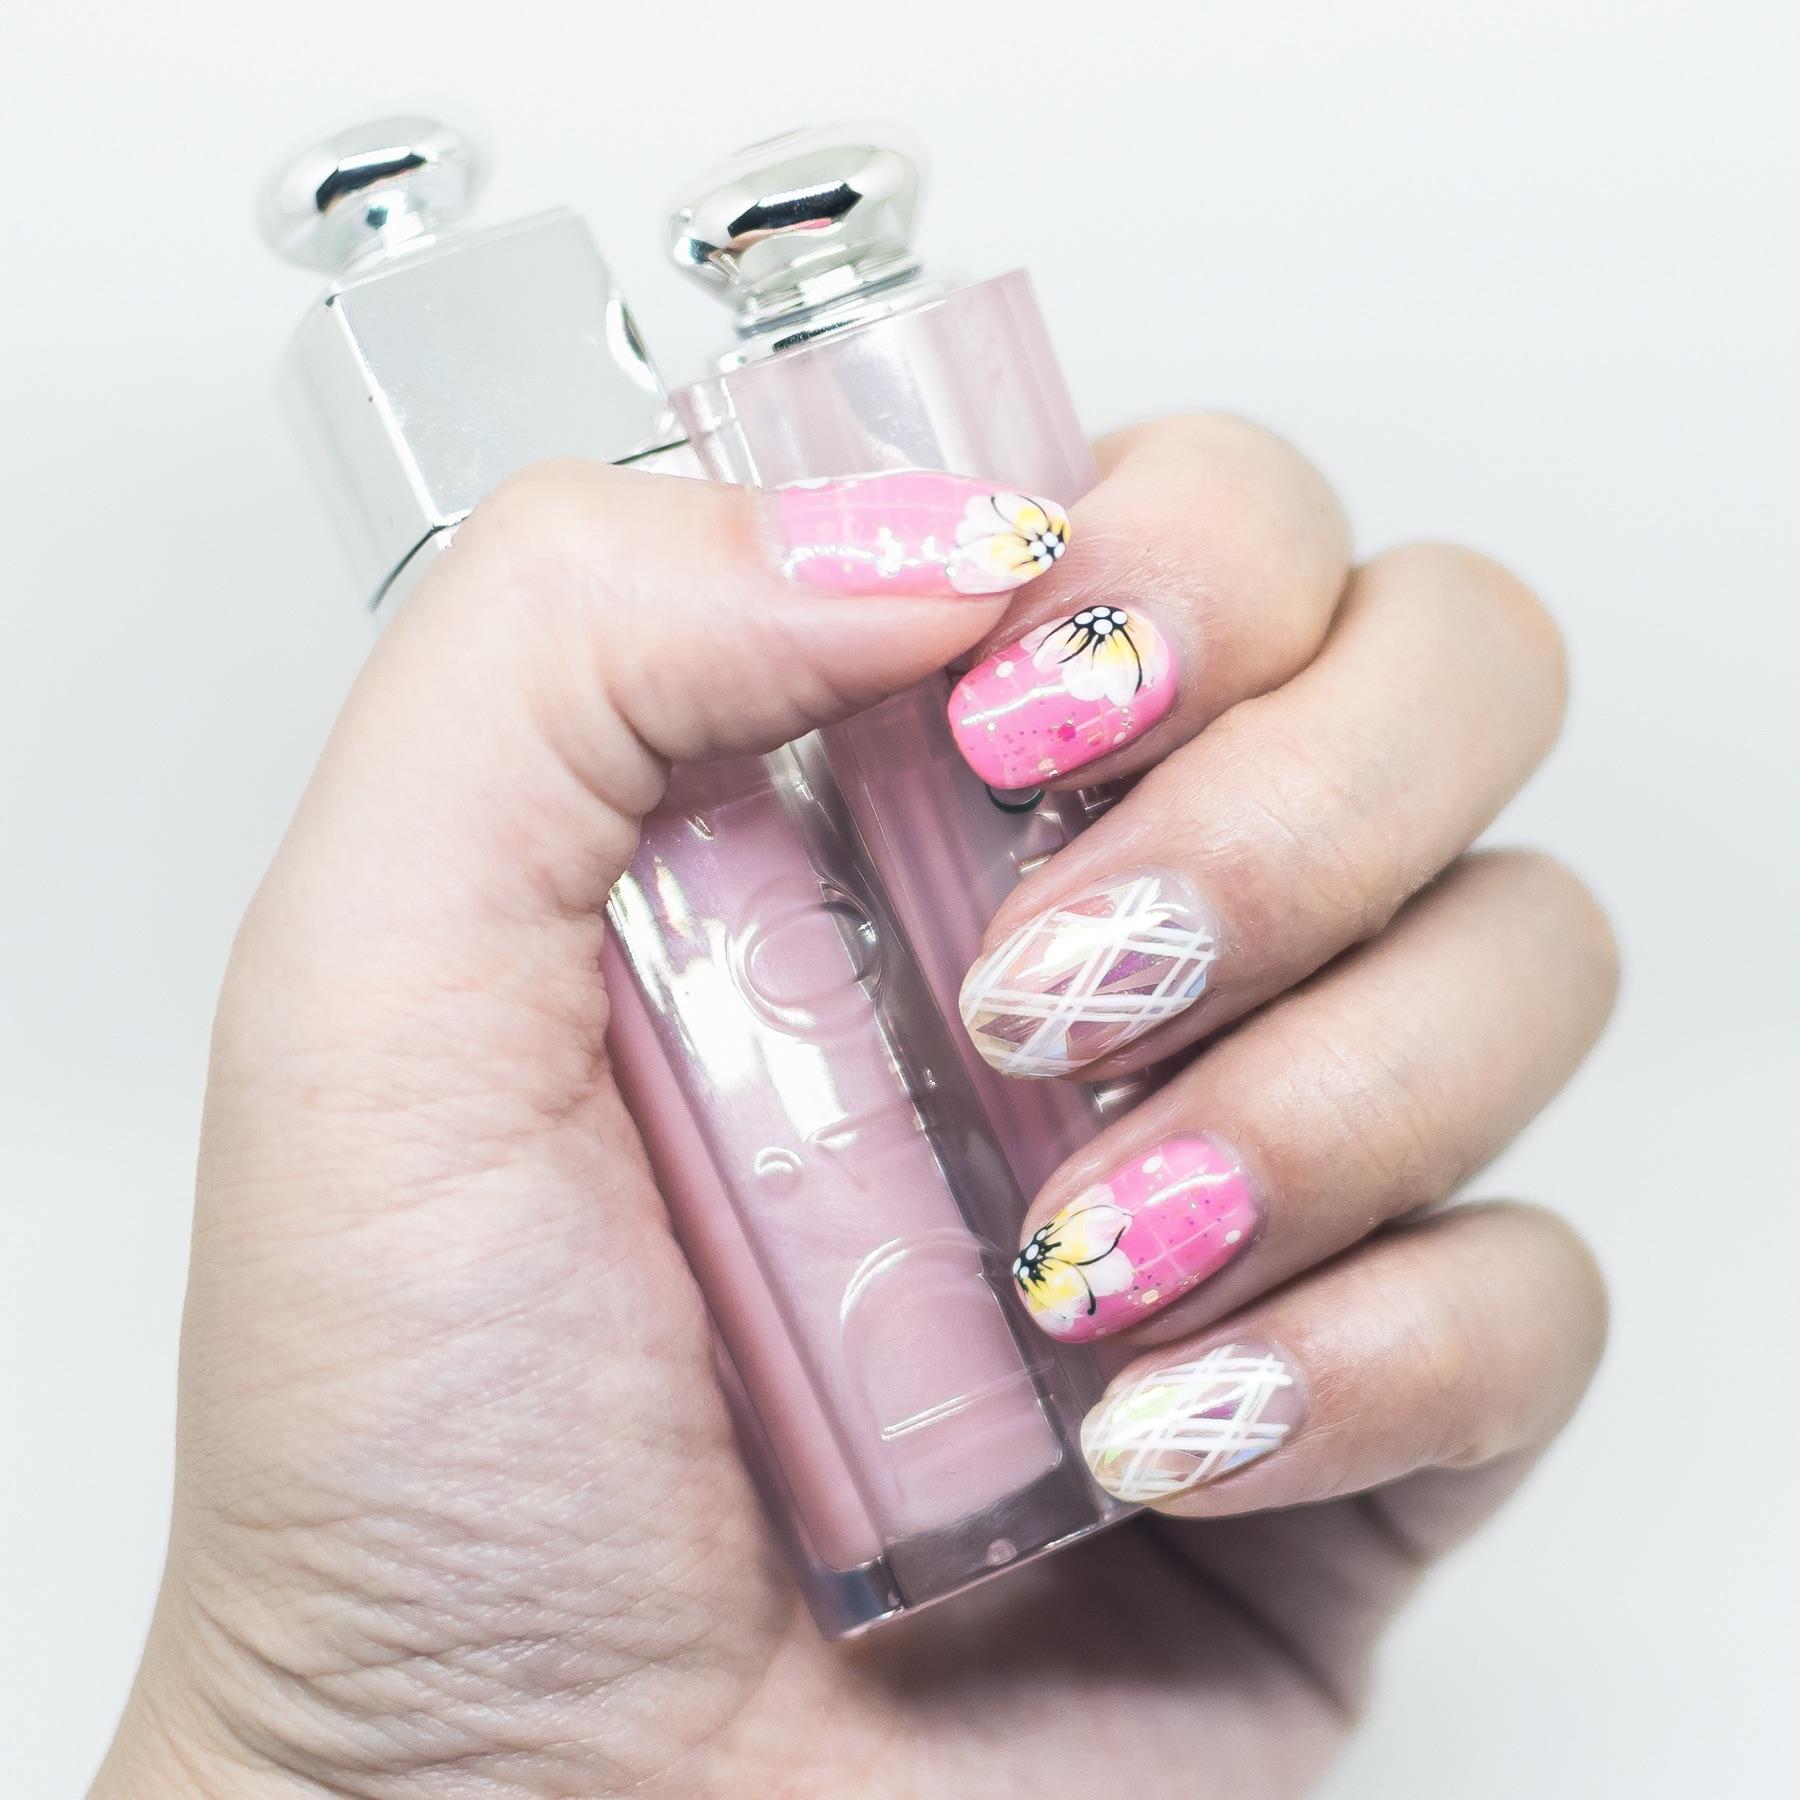 Coconut Nail Polish Strips: Instant manicure — Geeky Elephant